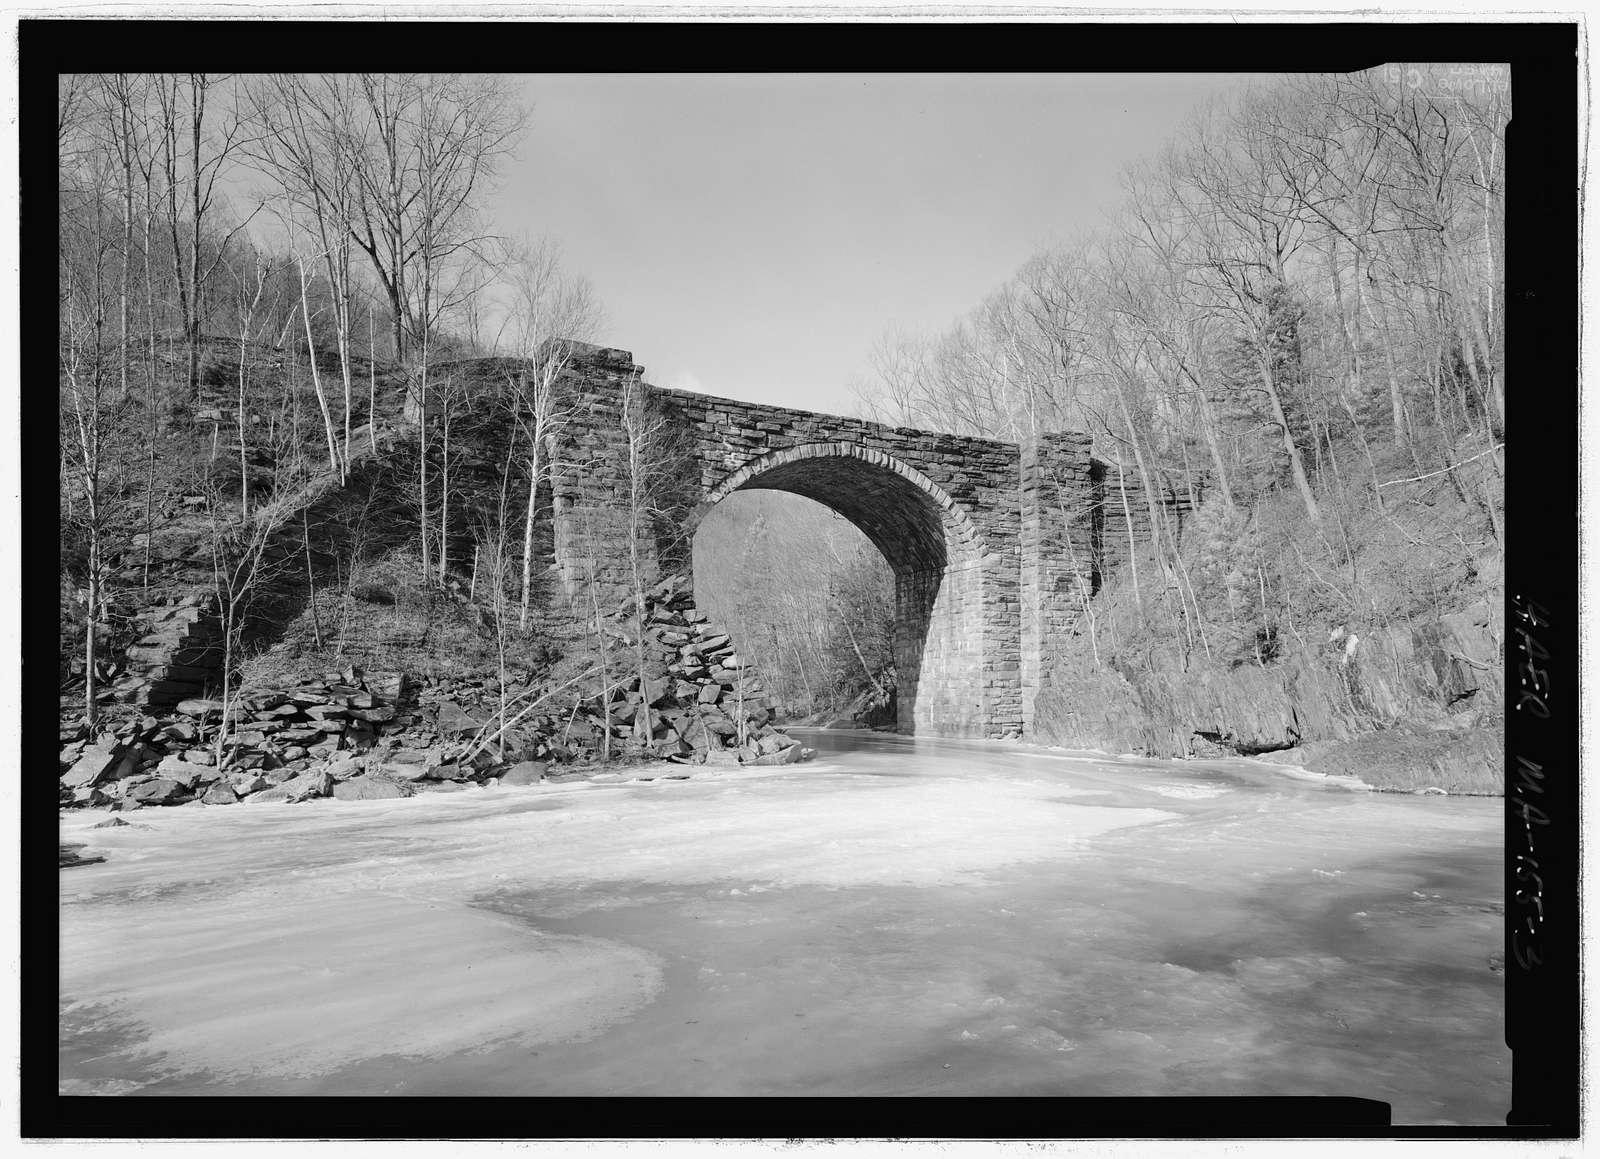 Whistler Bridge No. 4, Becket, Berkshire County, MA